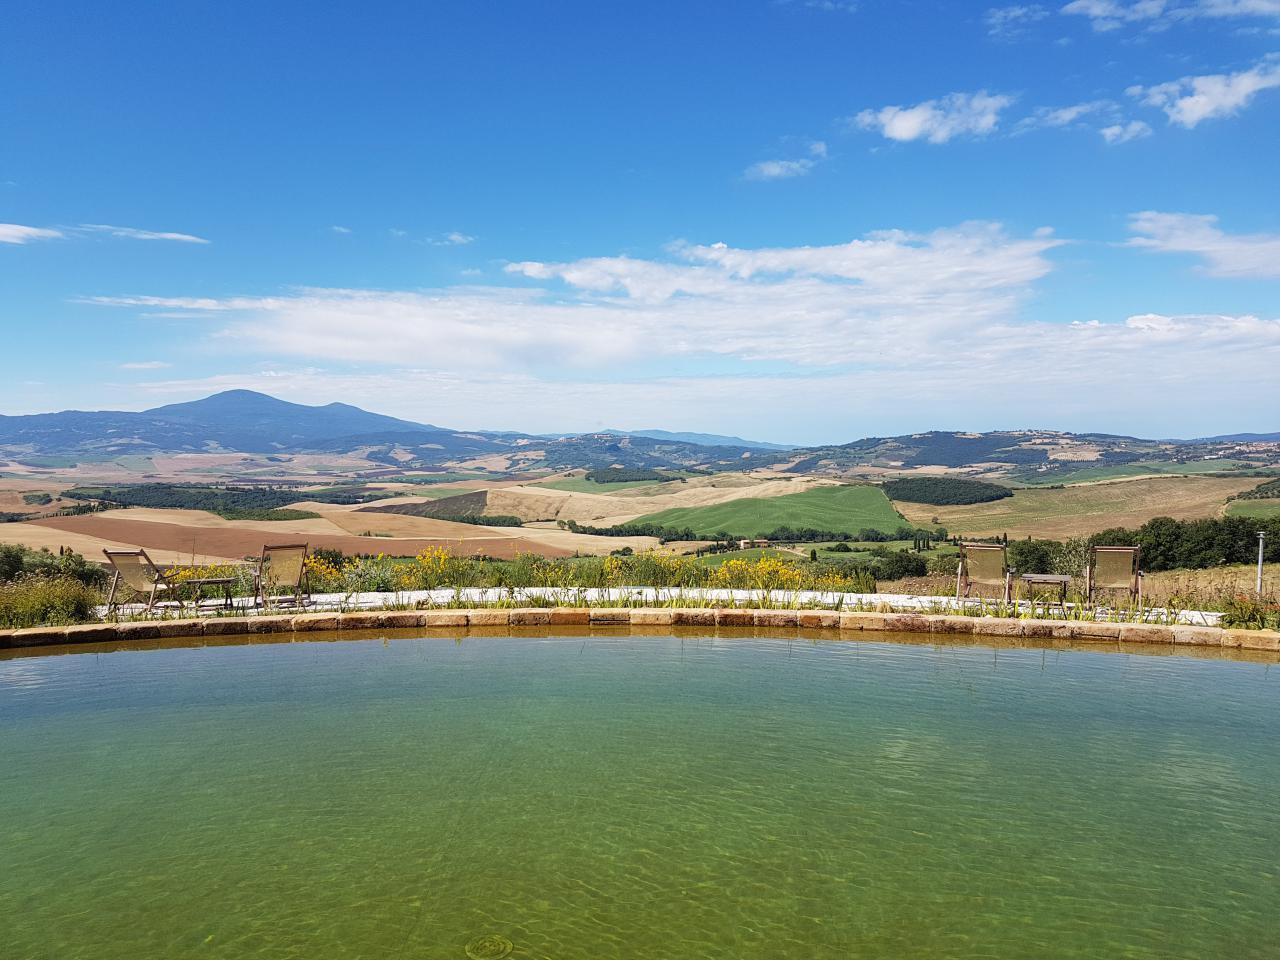 a440 in tuscany vojagon toscana italia B&B biolago piscina esterna